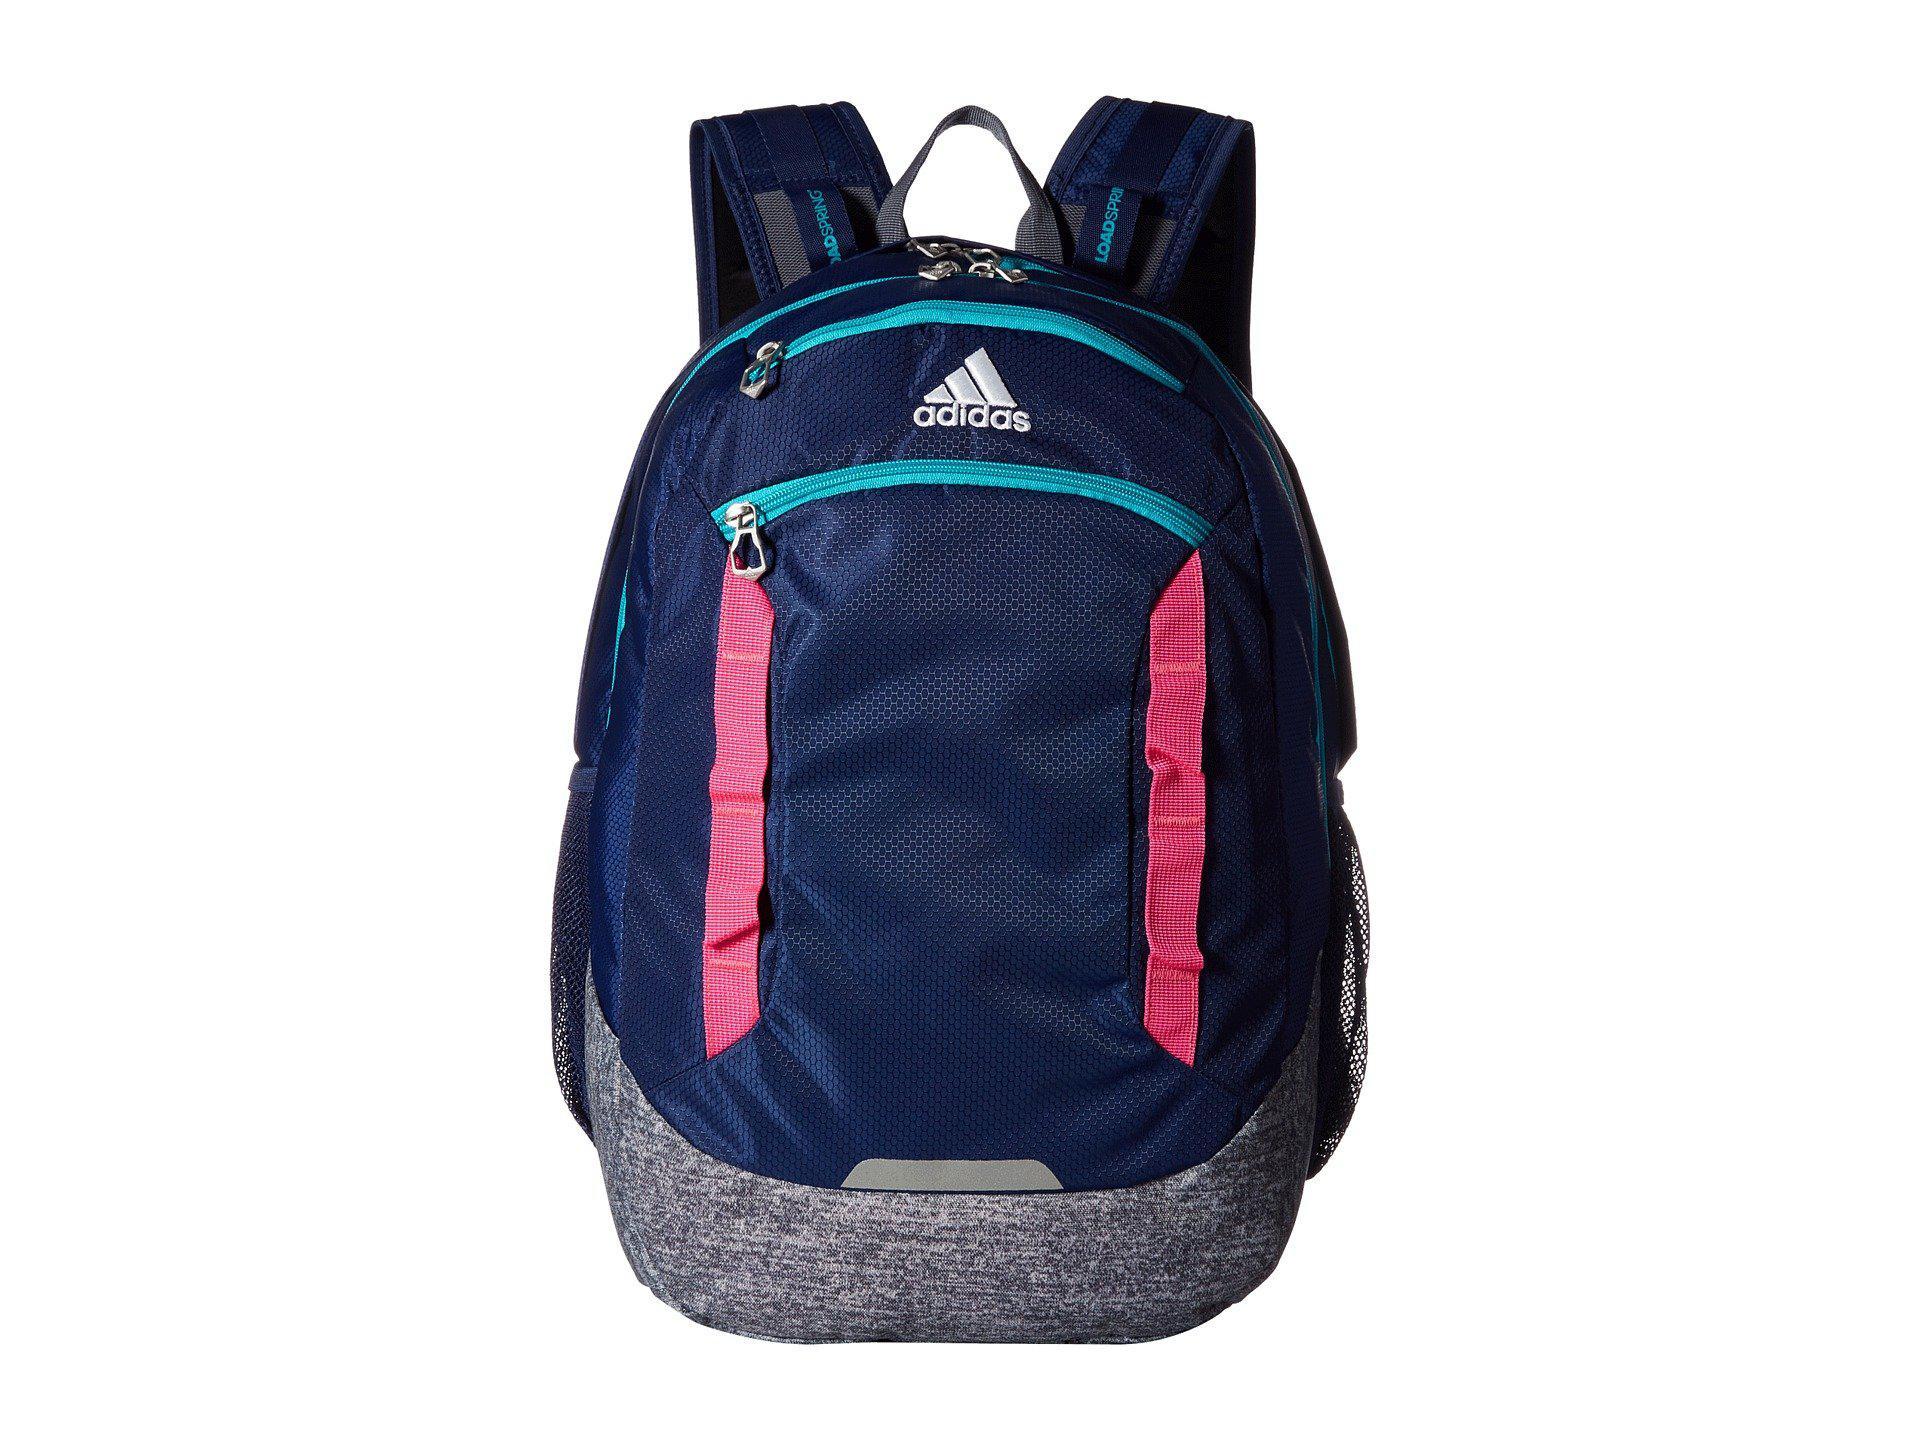 Adidas - Blue Excel Iv Backpack - Lyst. View fullscreen 470fb9177dc14